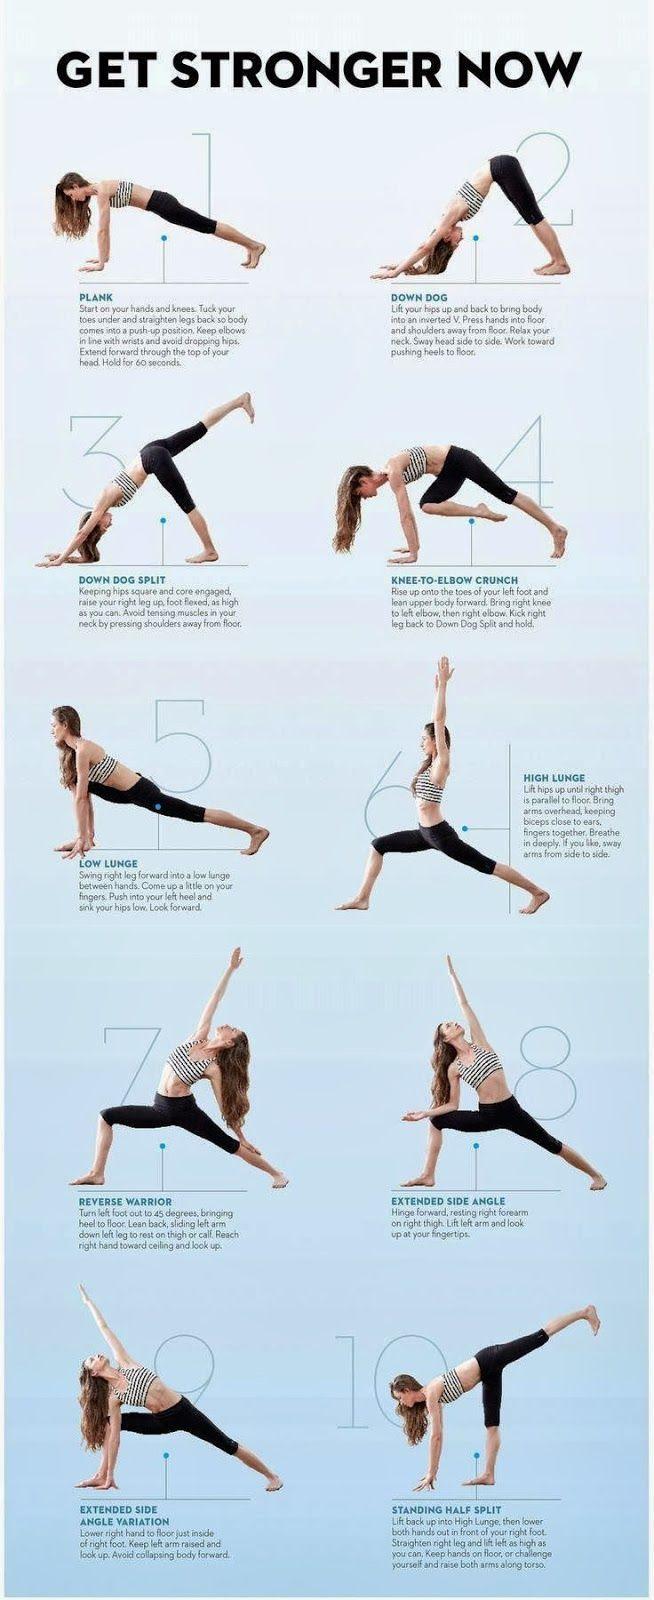 Yoga Poses For Balance And Strength